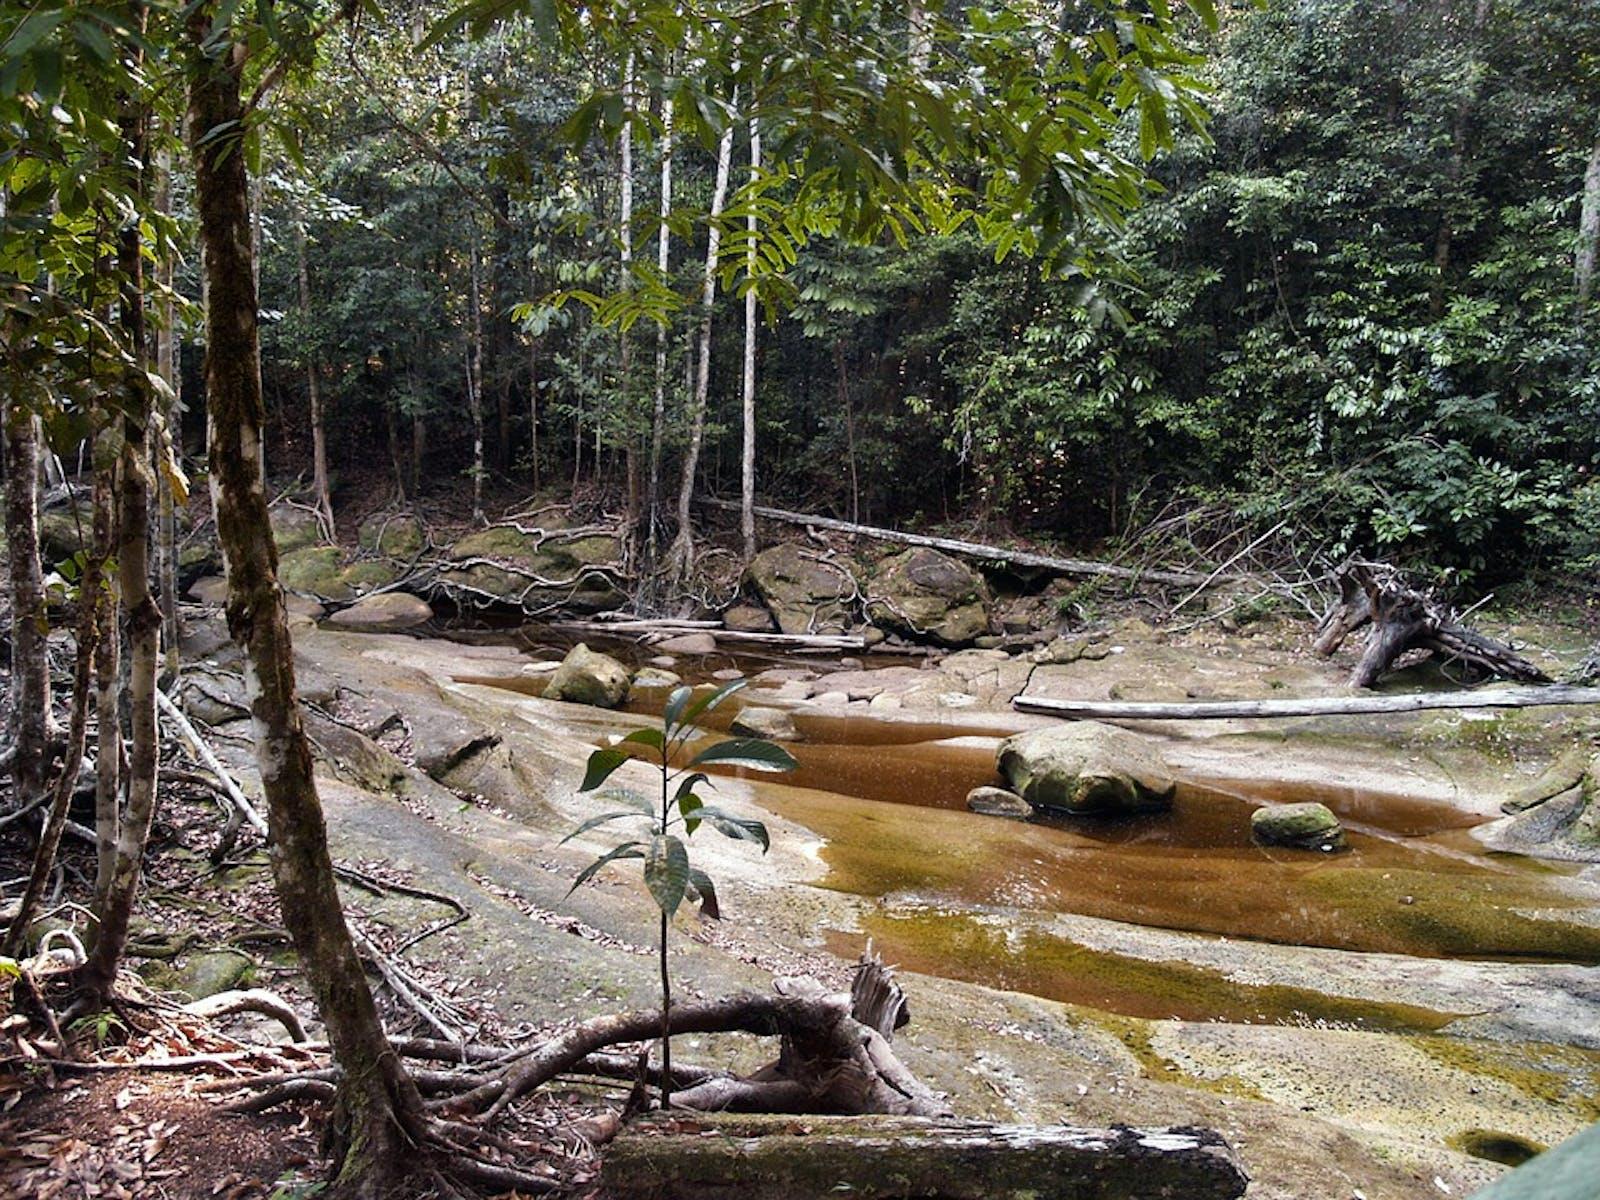 Uatumã-Trombetas Moist Forests